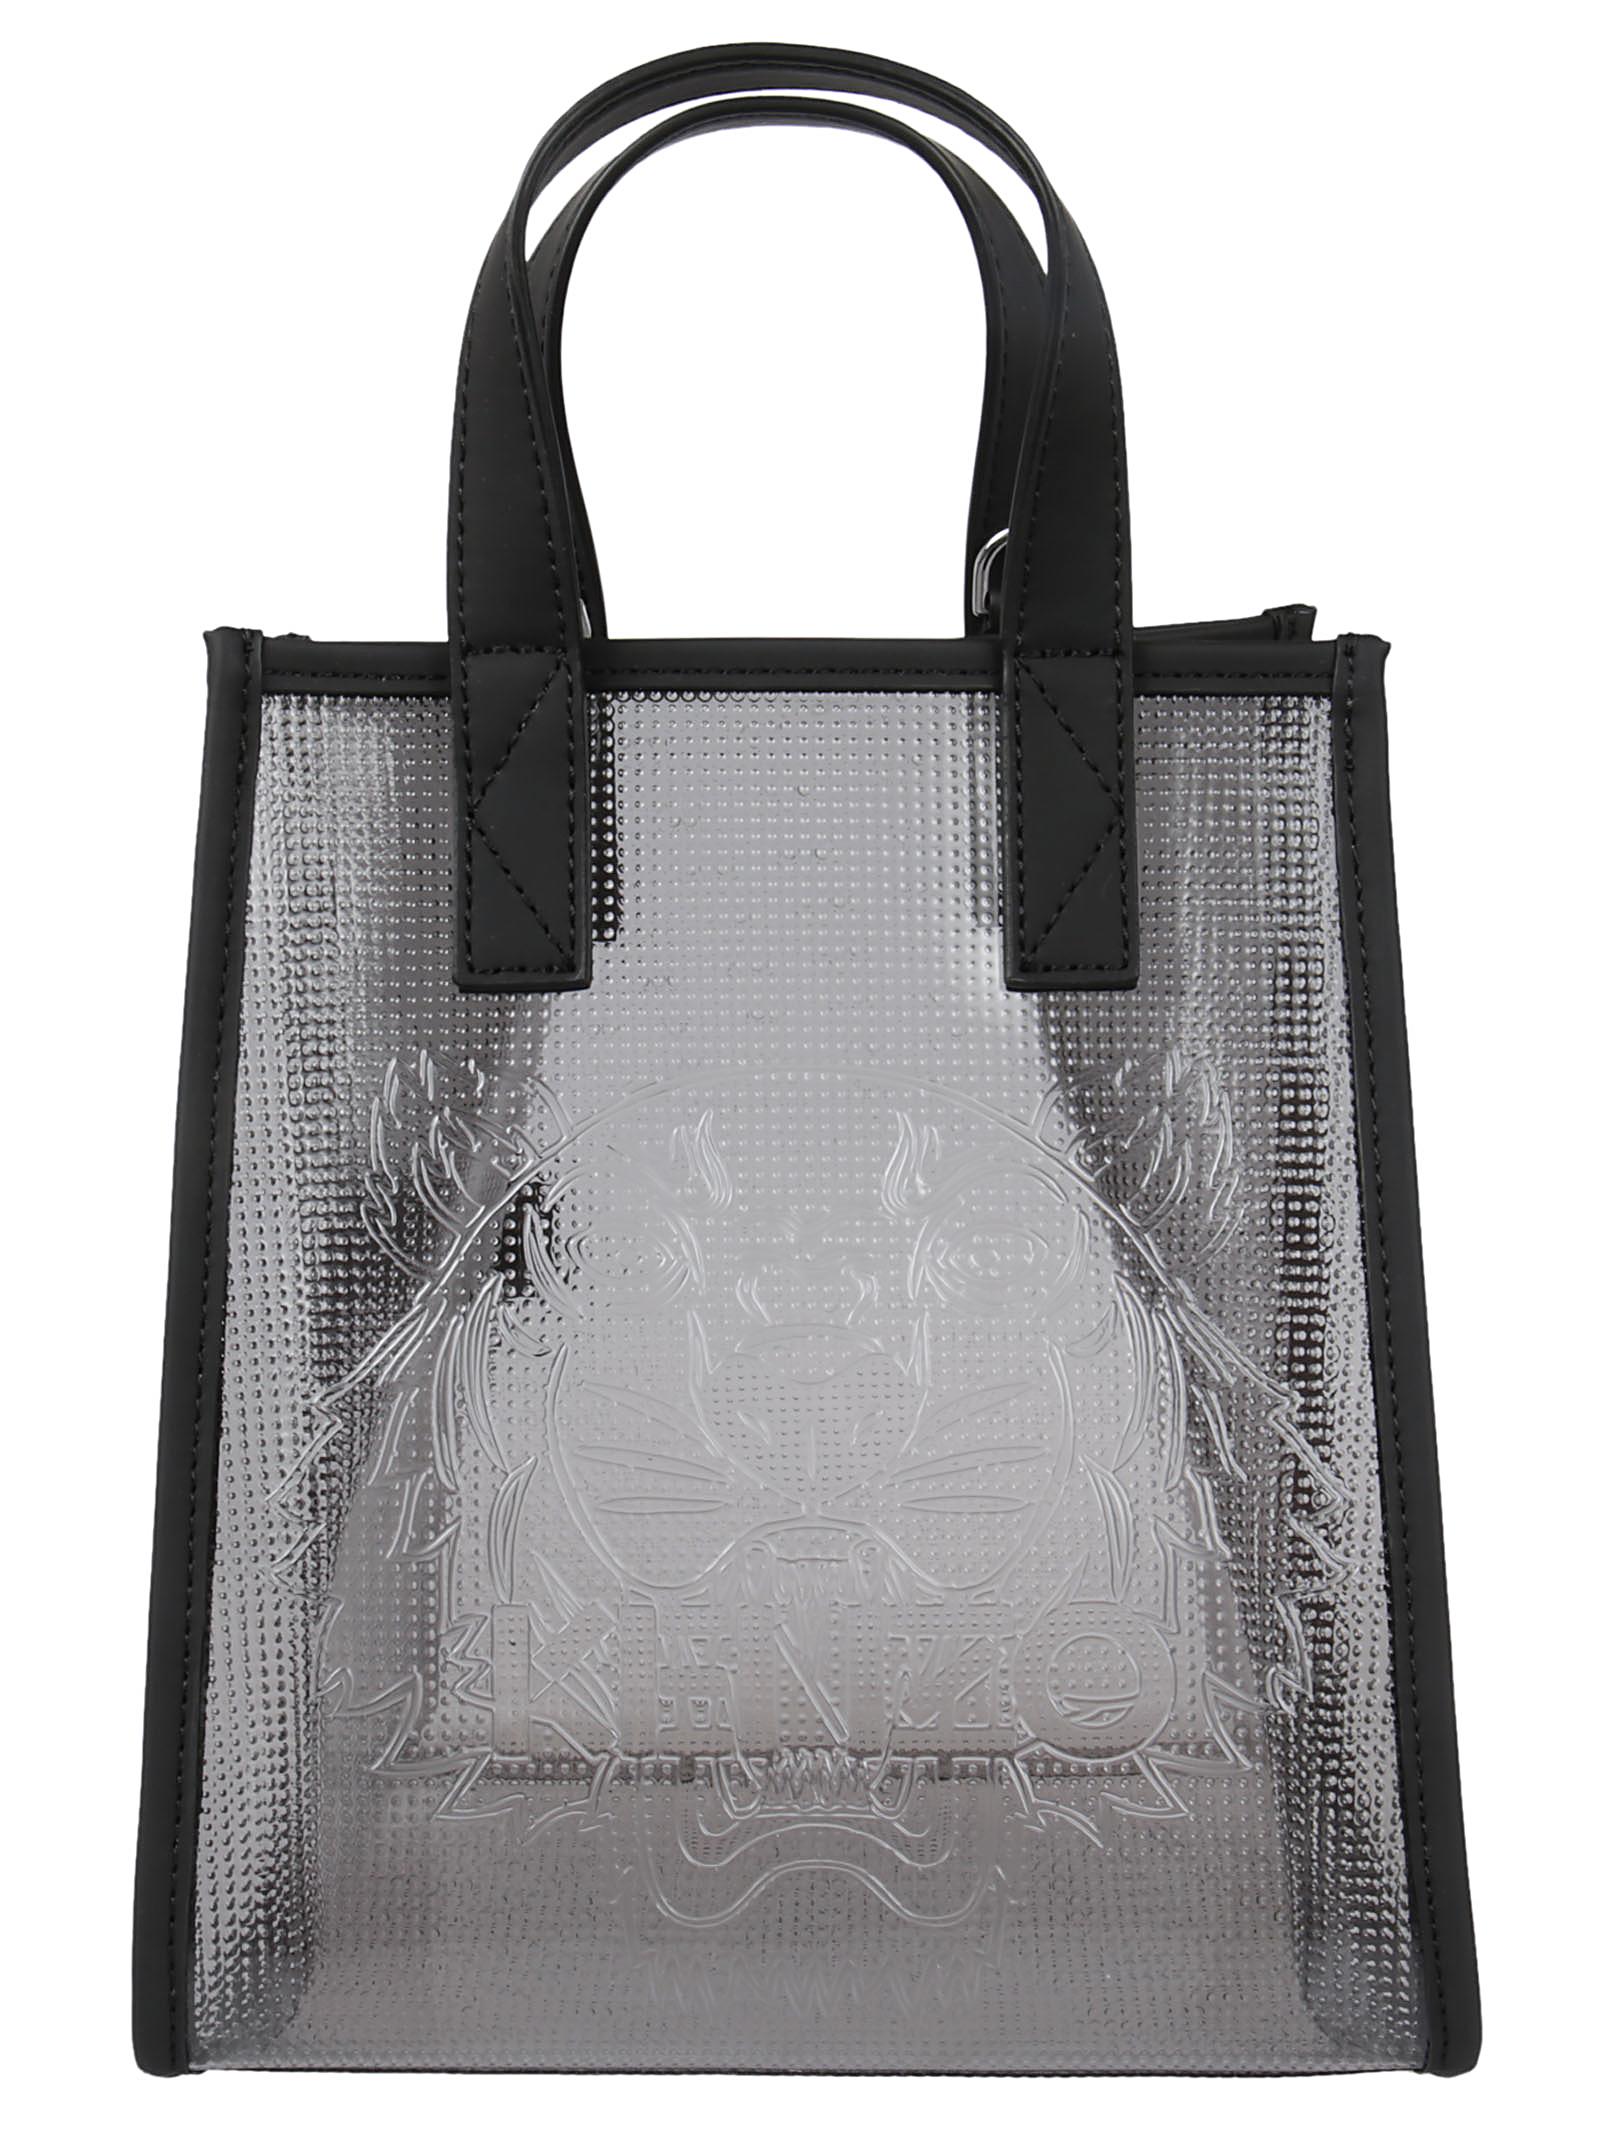 Kenzo Kenzo Tiger Shopper Bag